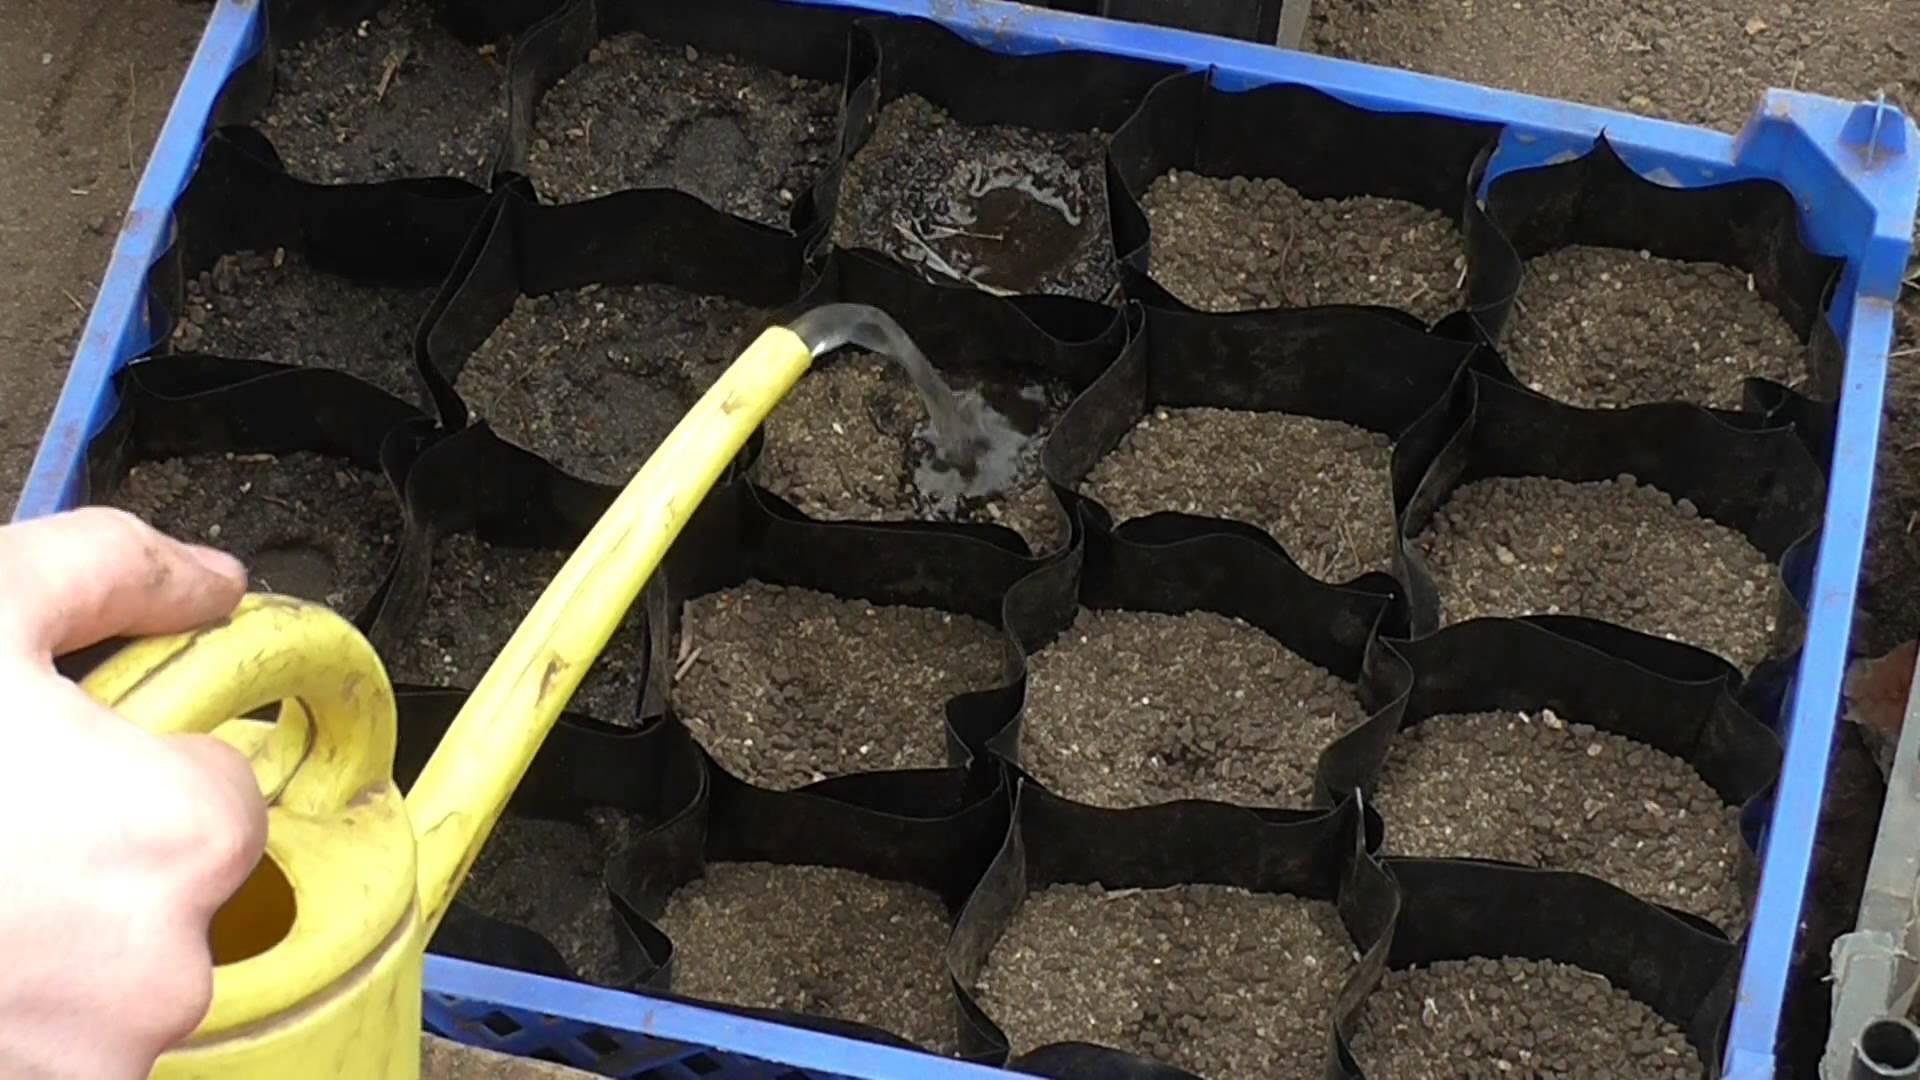 Подготовка семян кабачков к посеву на рассаду в домашних условиях 69